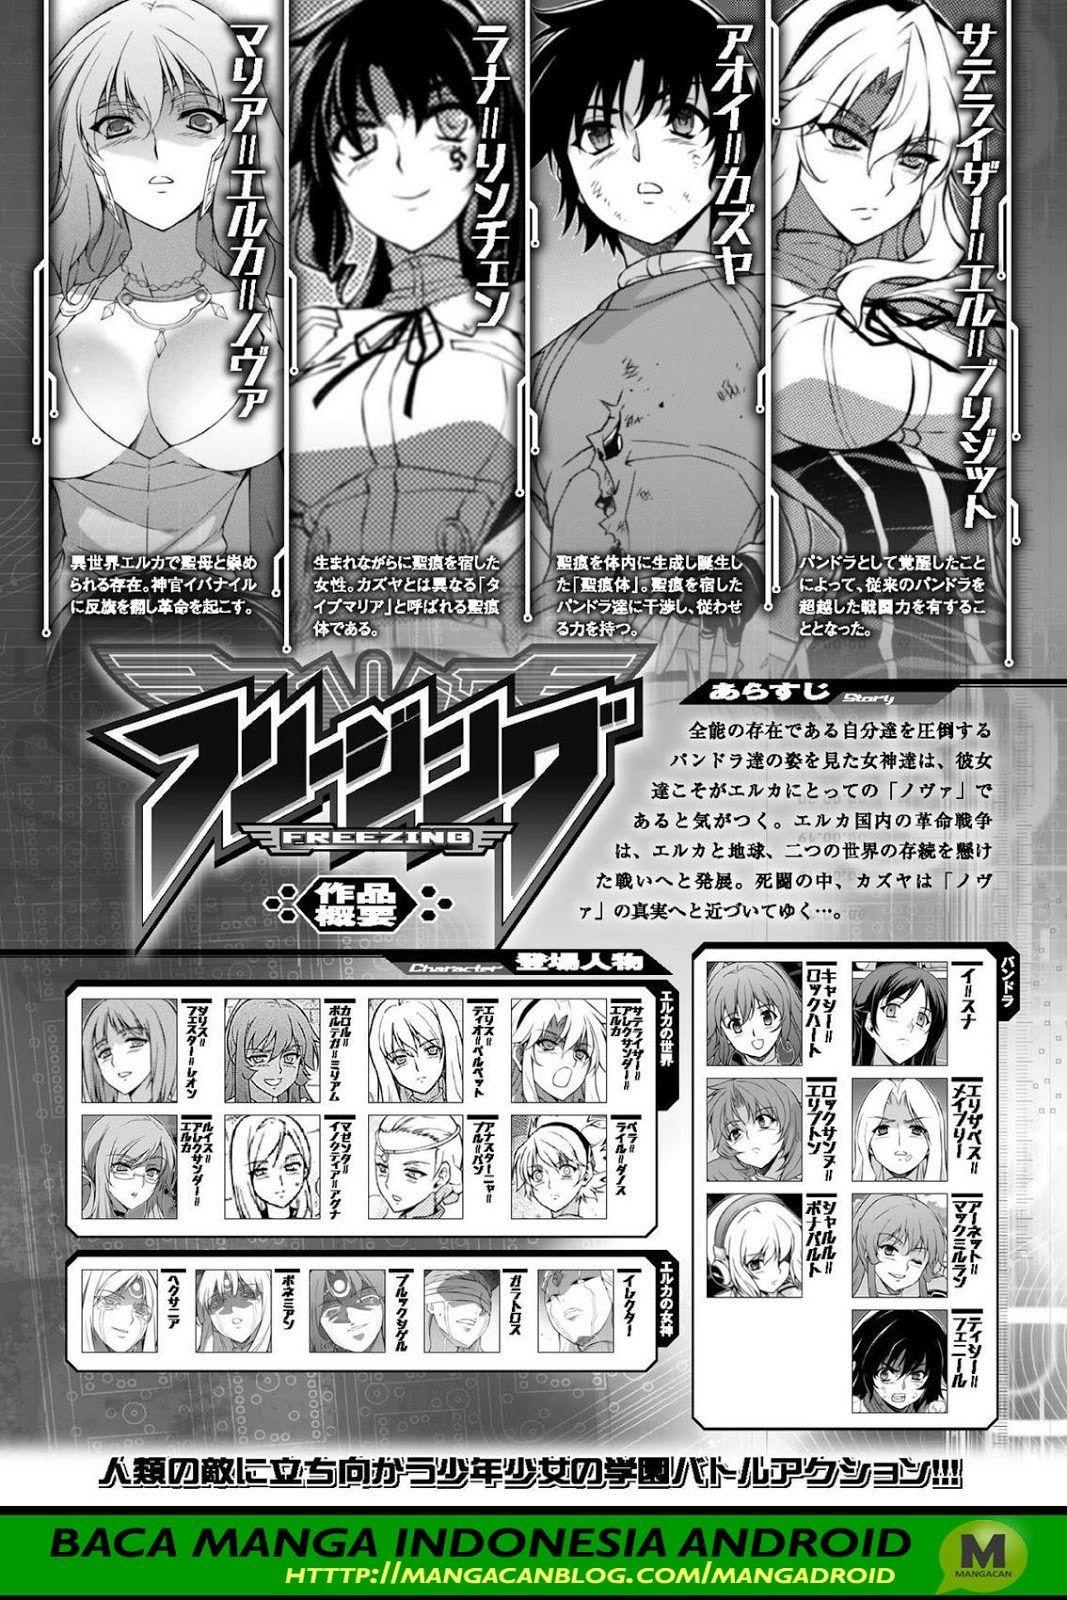 komik freezing 223  komik manga baca manga manga